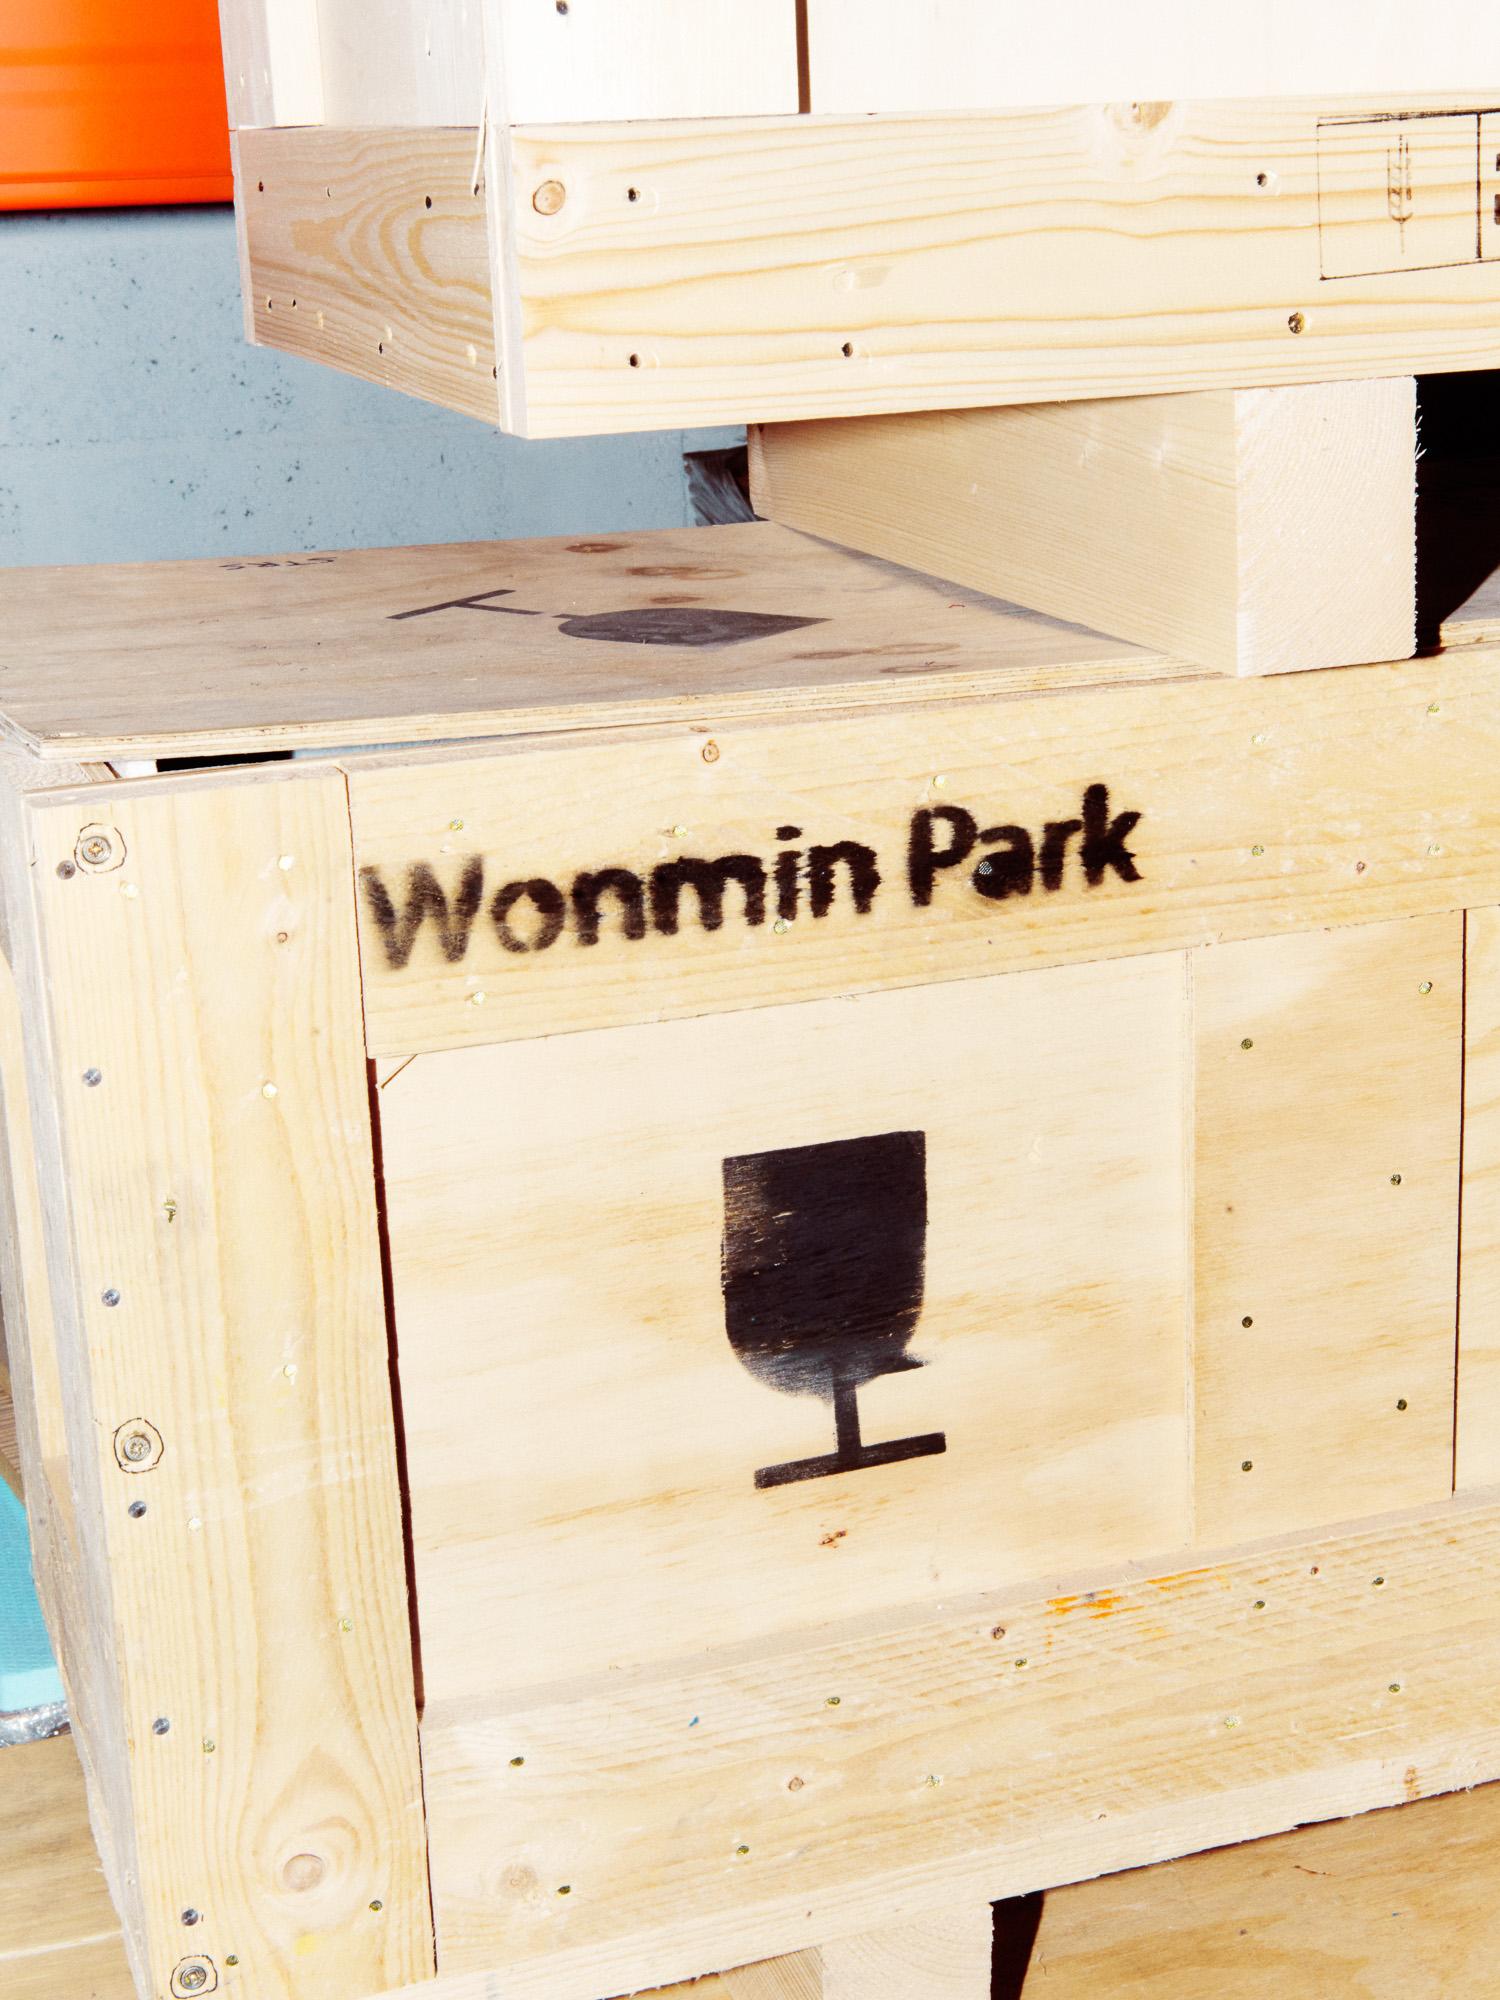 WonminPark-ThomasChene-9274